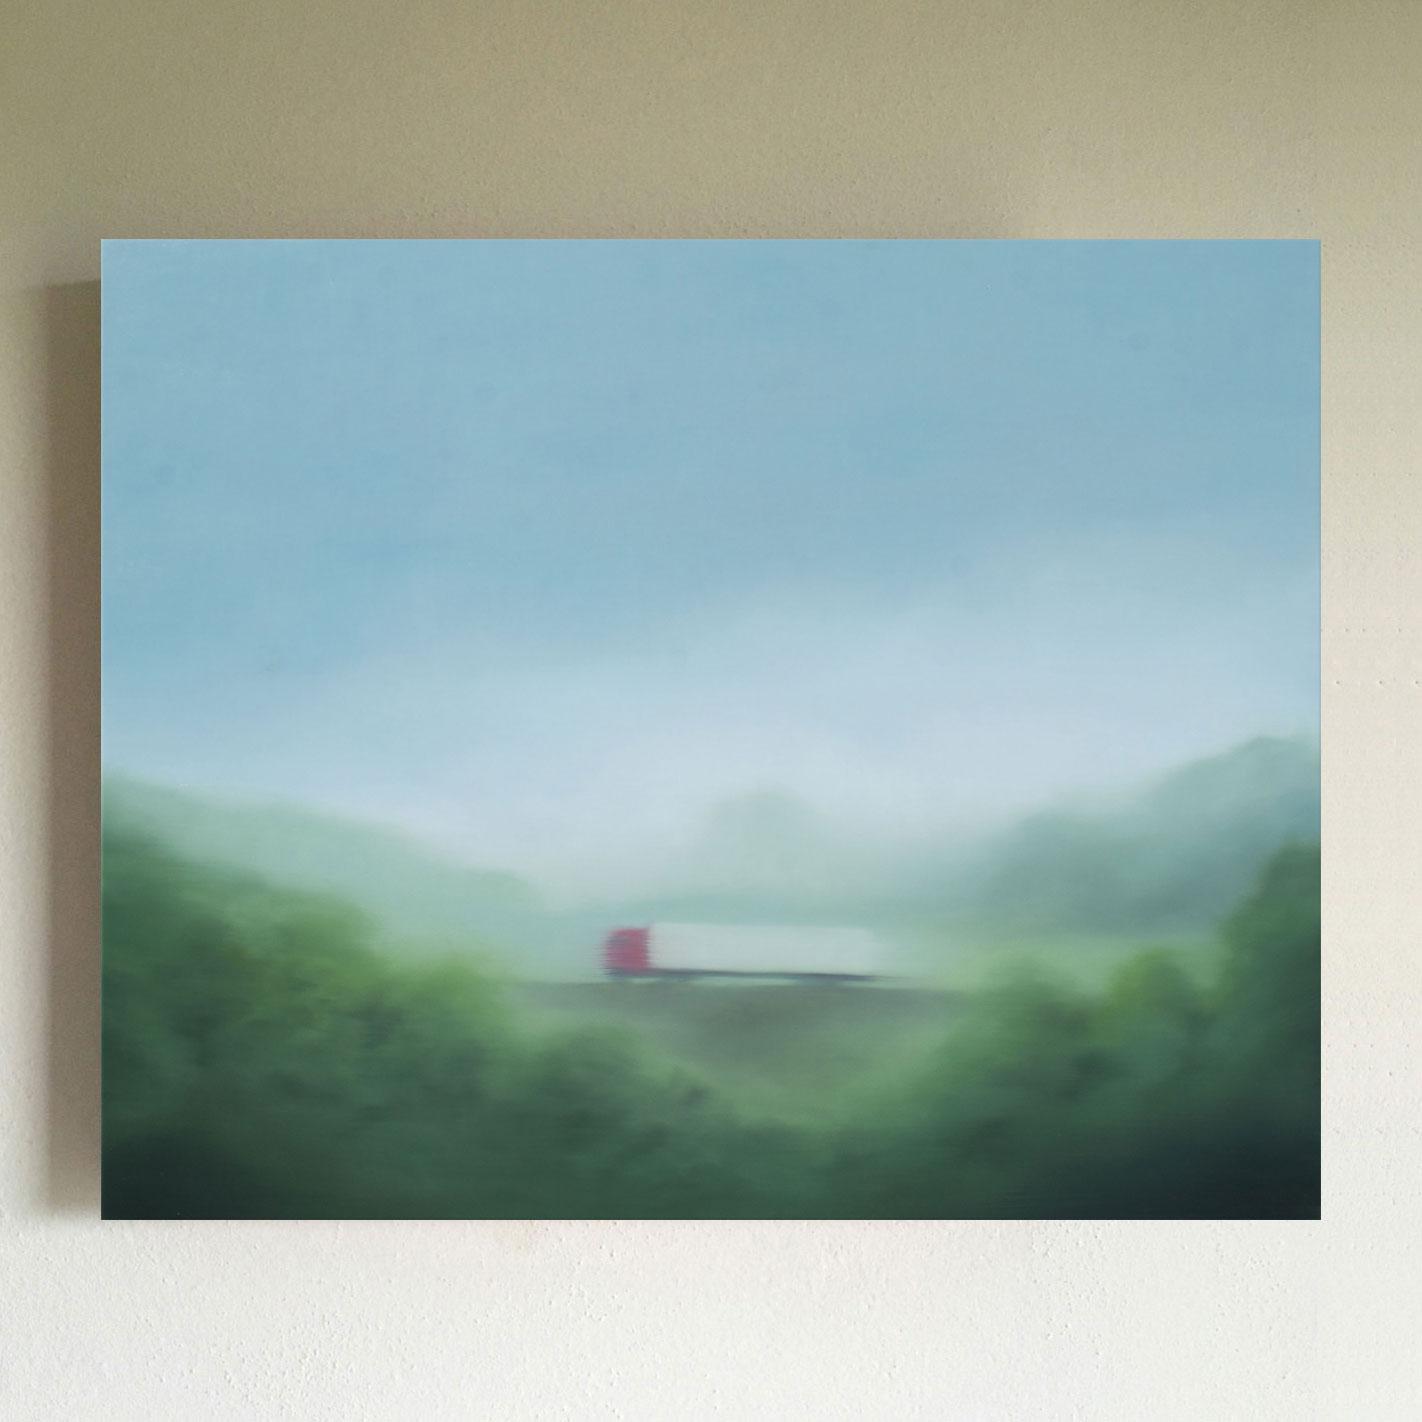 T#97-2013, oil on canvas, 90x110cm, priv. coll.